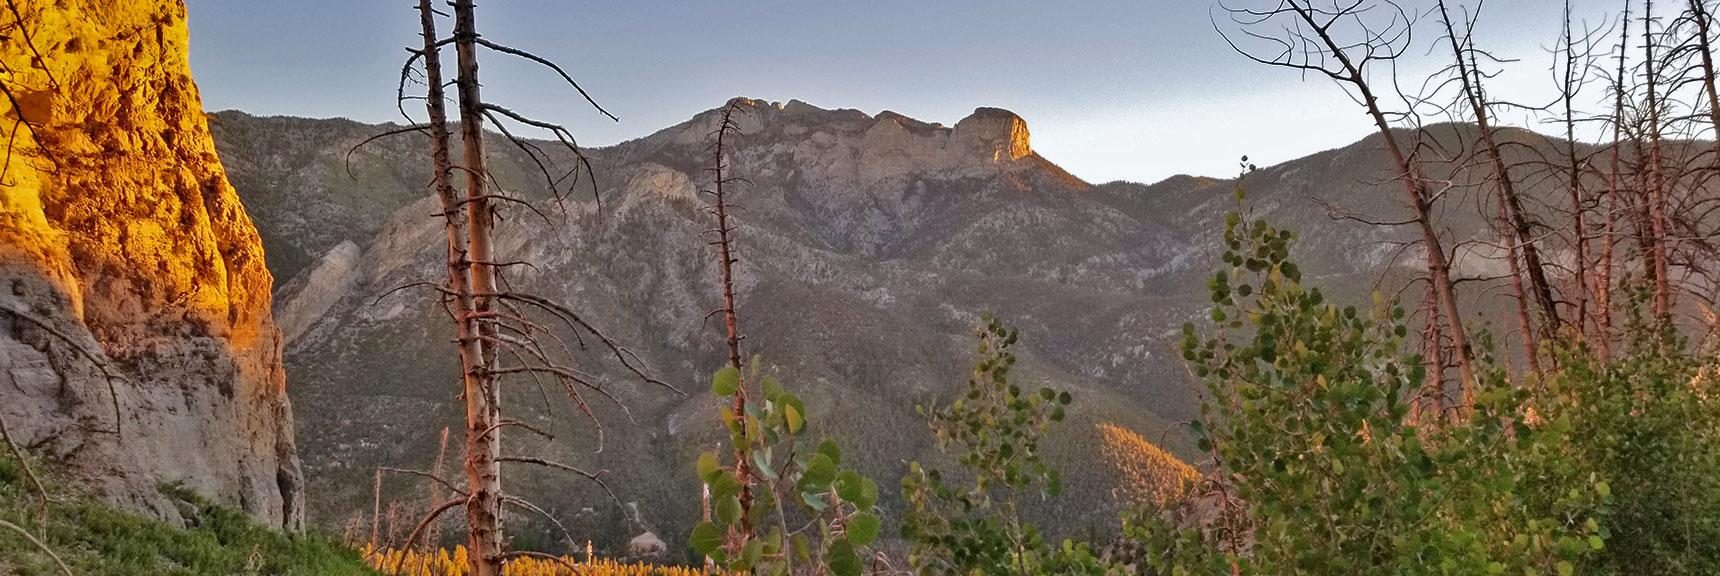 Mummy Mountain from Lower Switchbacks on South Climb Trail | Griffith Peak & Charleston Peak Circuit Run, Spring Mountains, Nevada